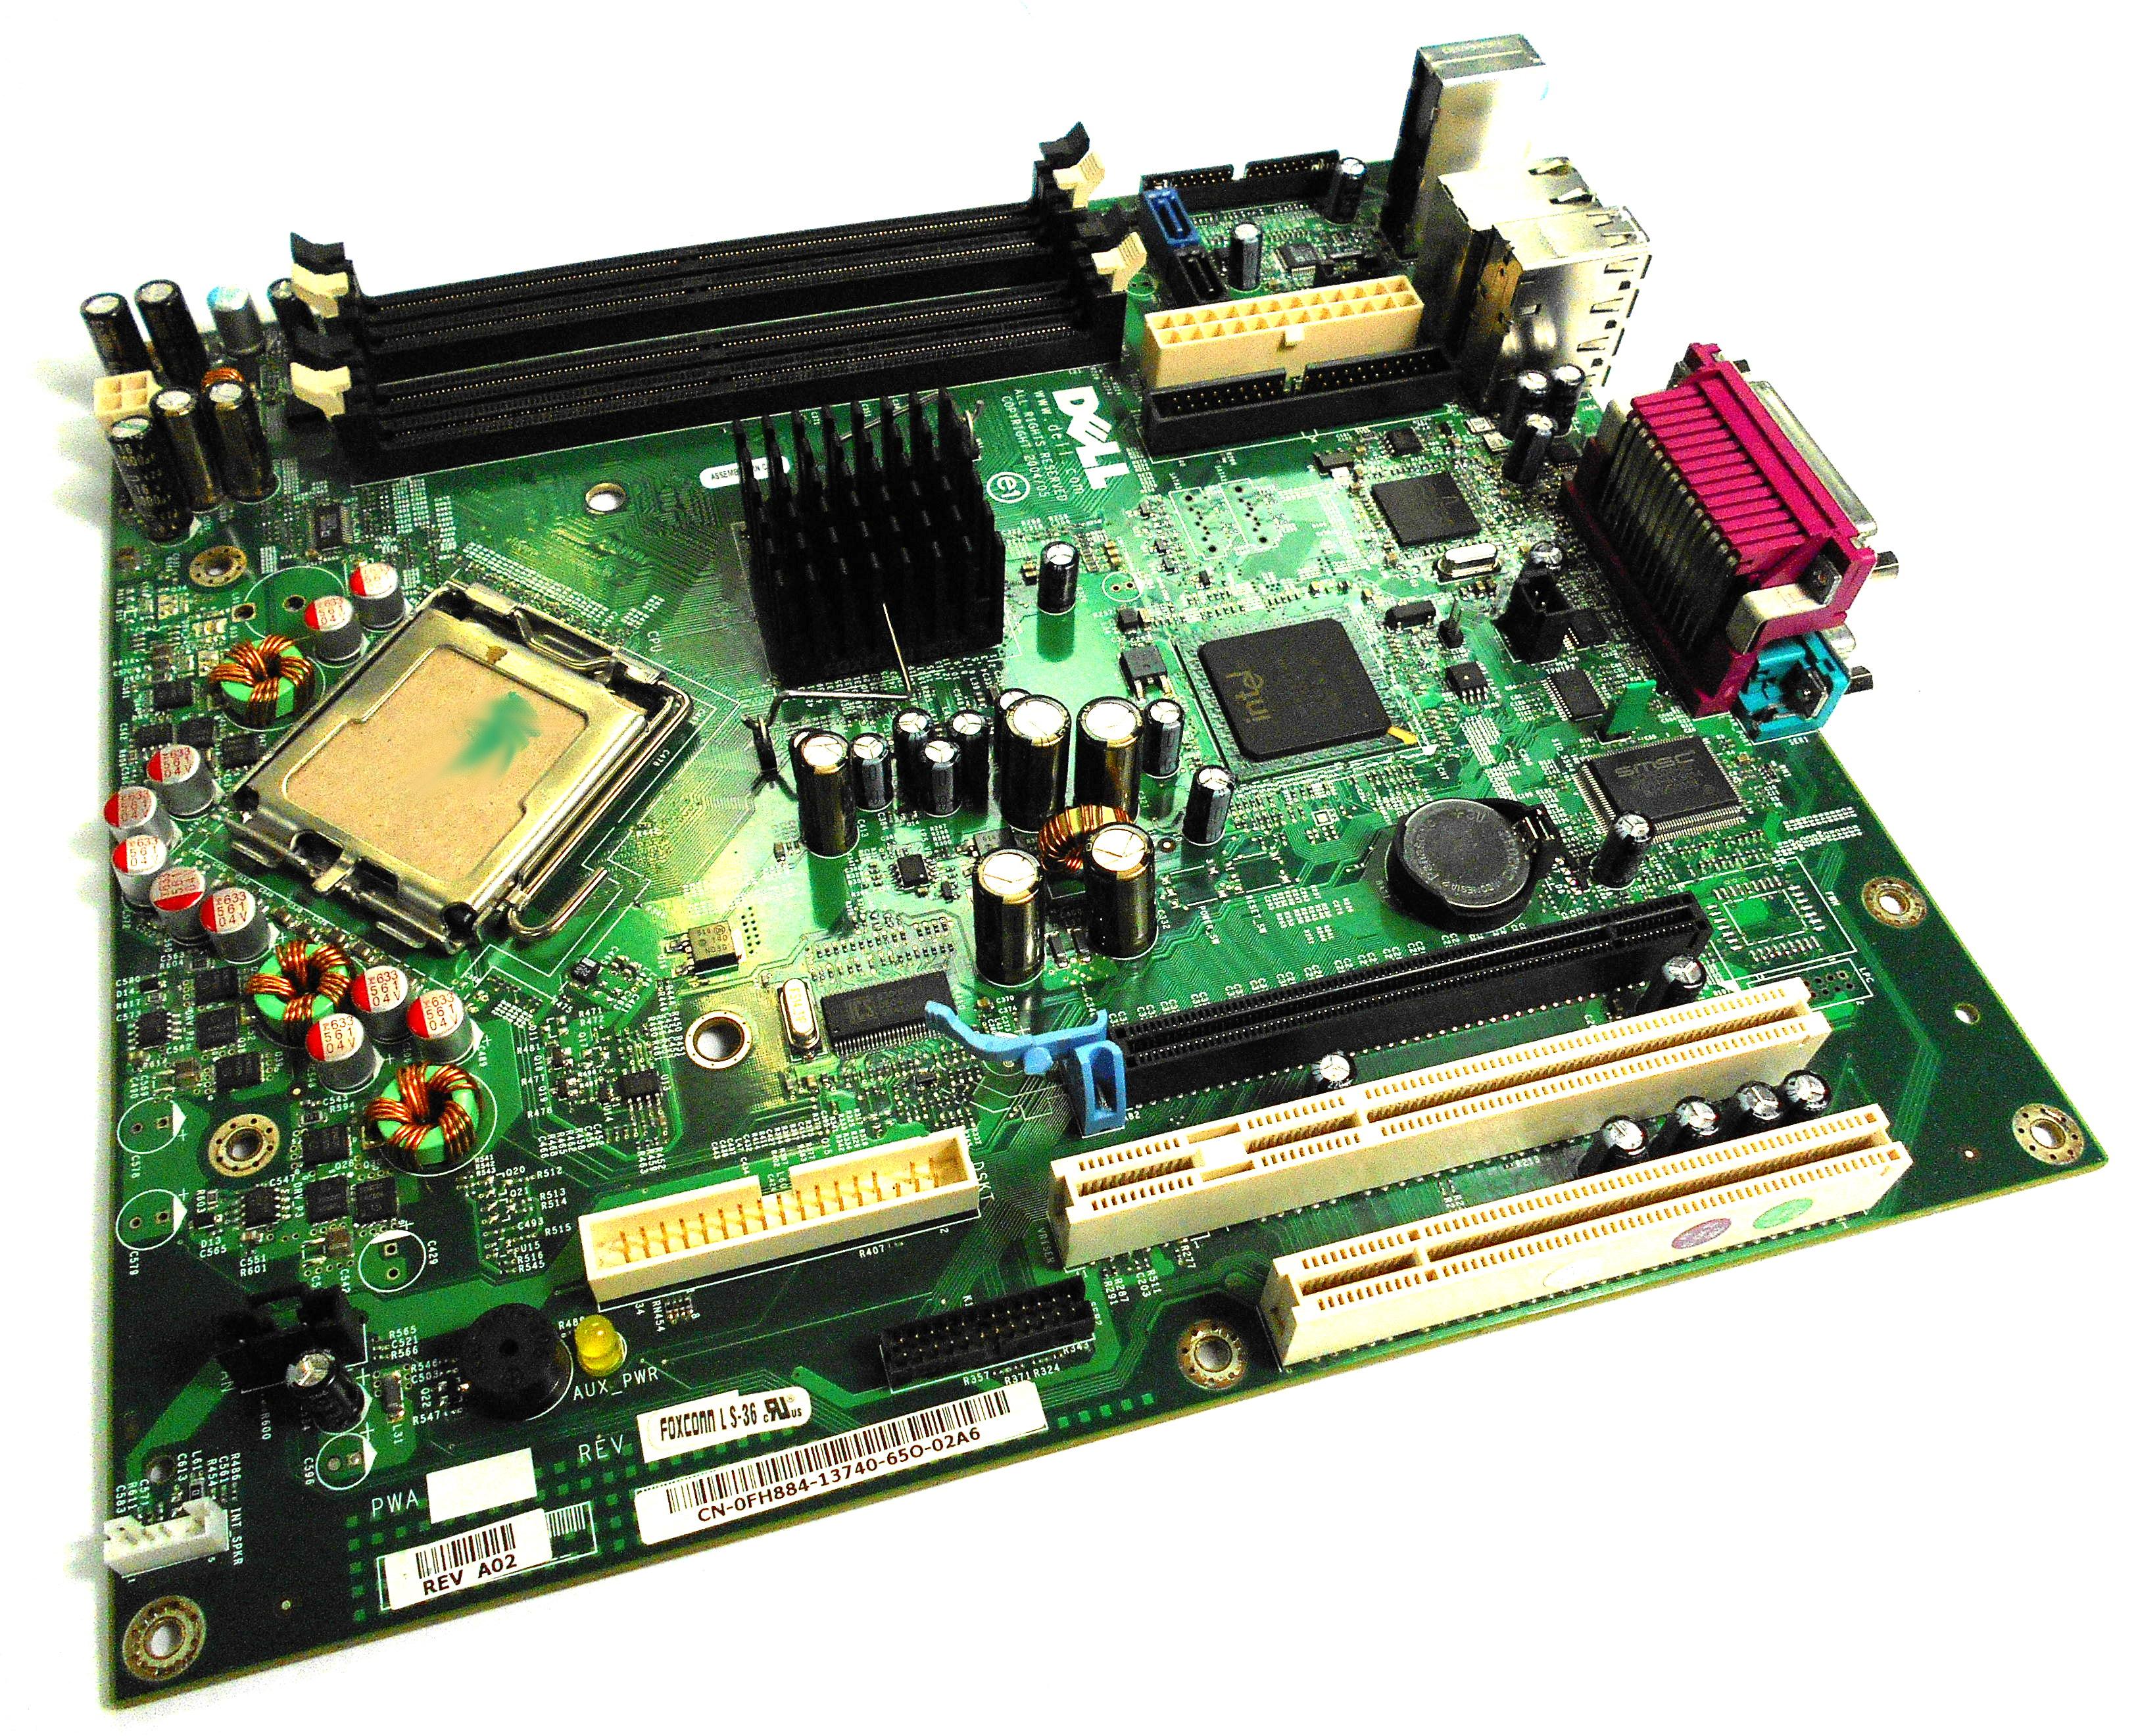 Broadcom bcm5751pkfbg